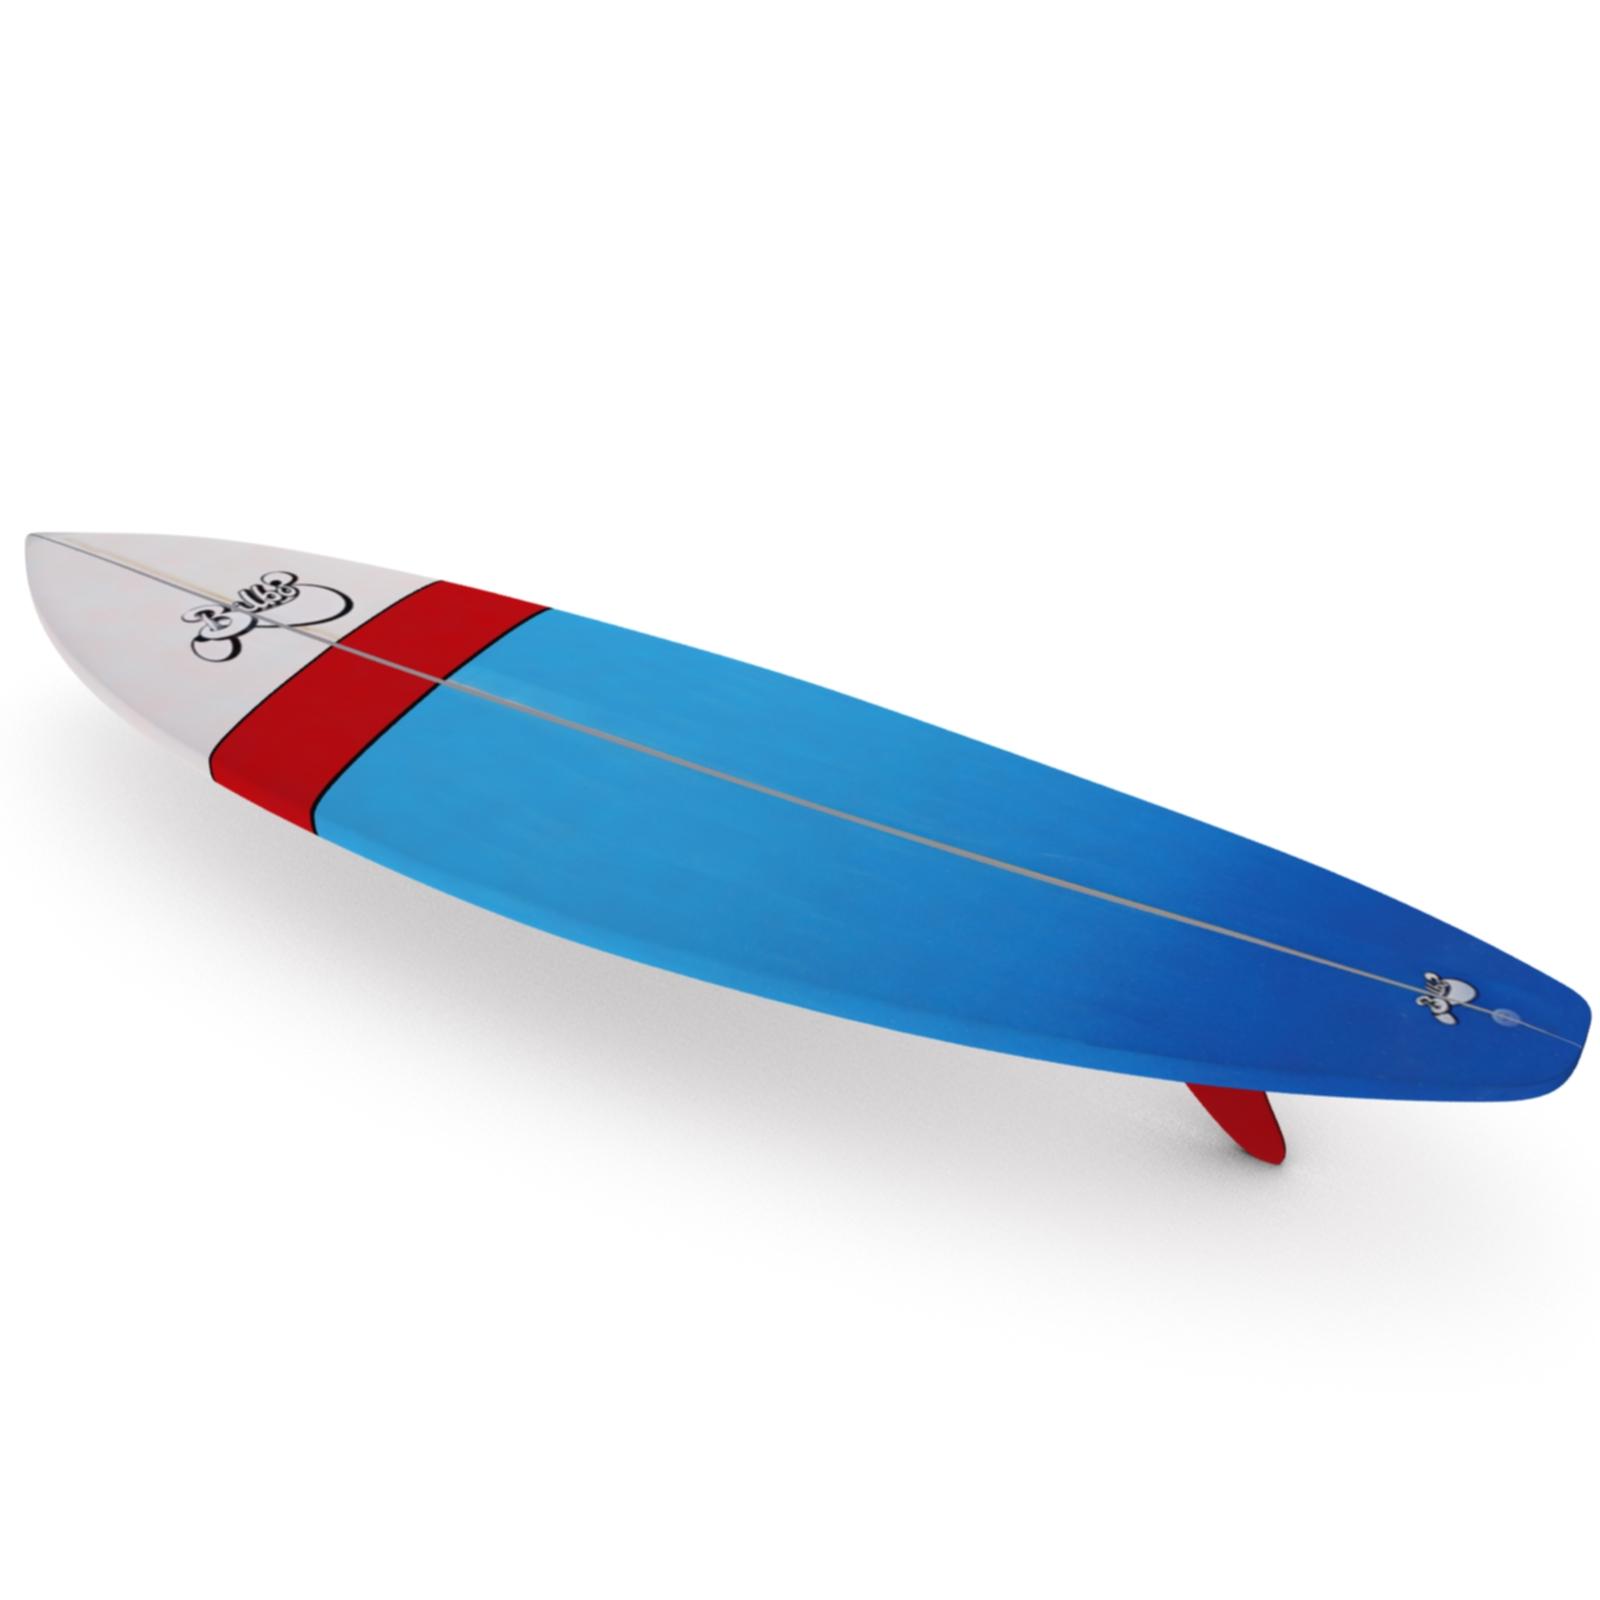 Surfboard 05